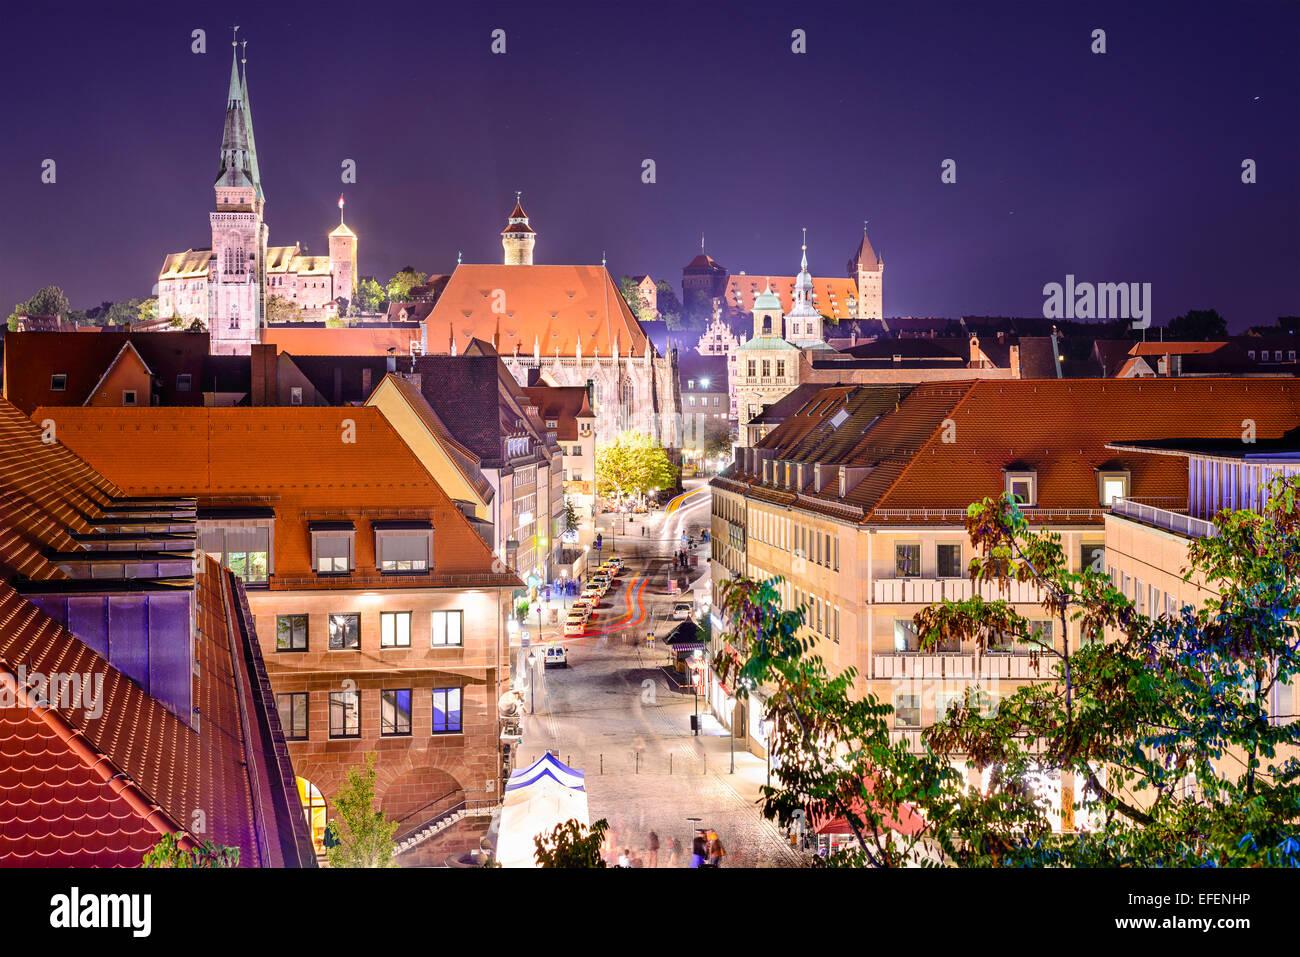 Nuremberg, Germany old town skyline. - Stock Image